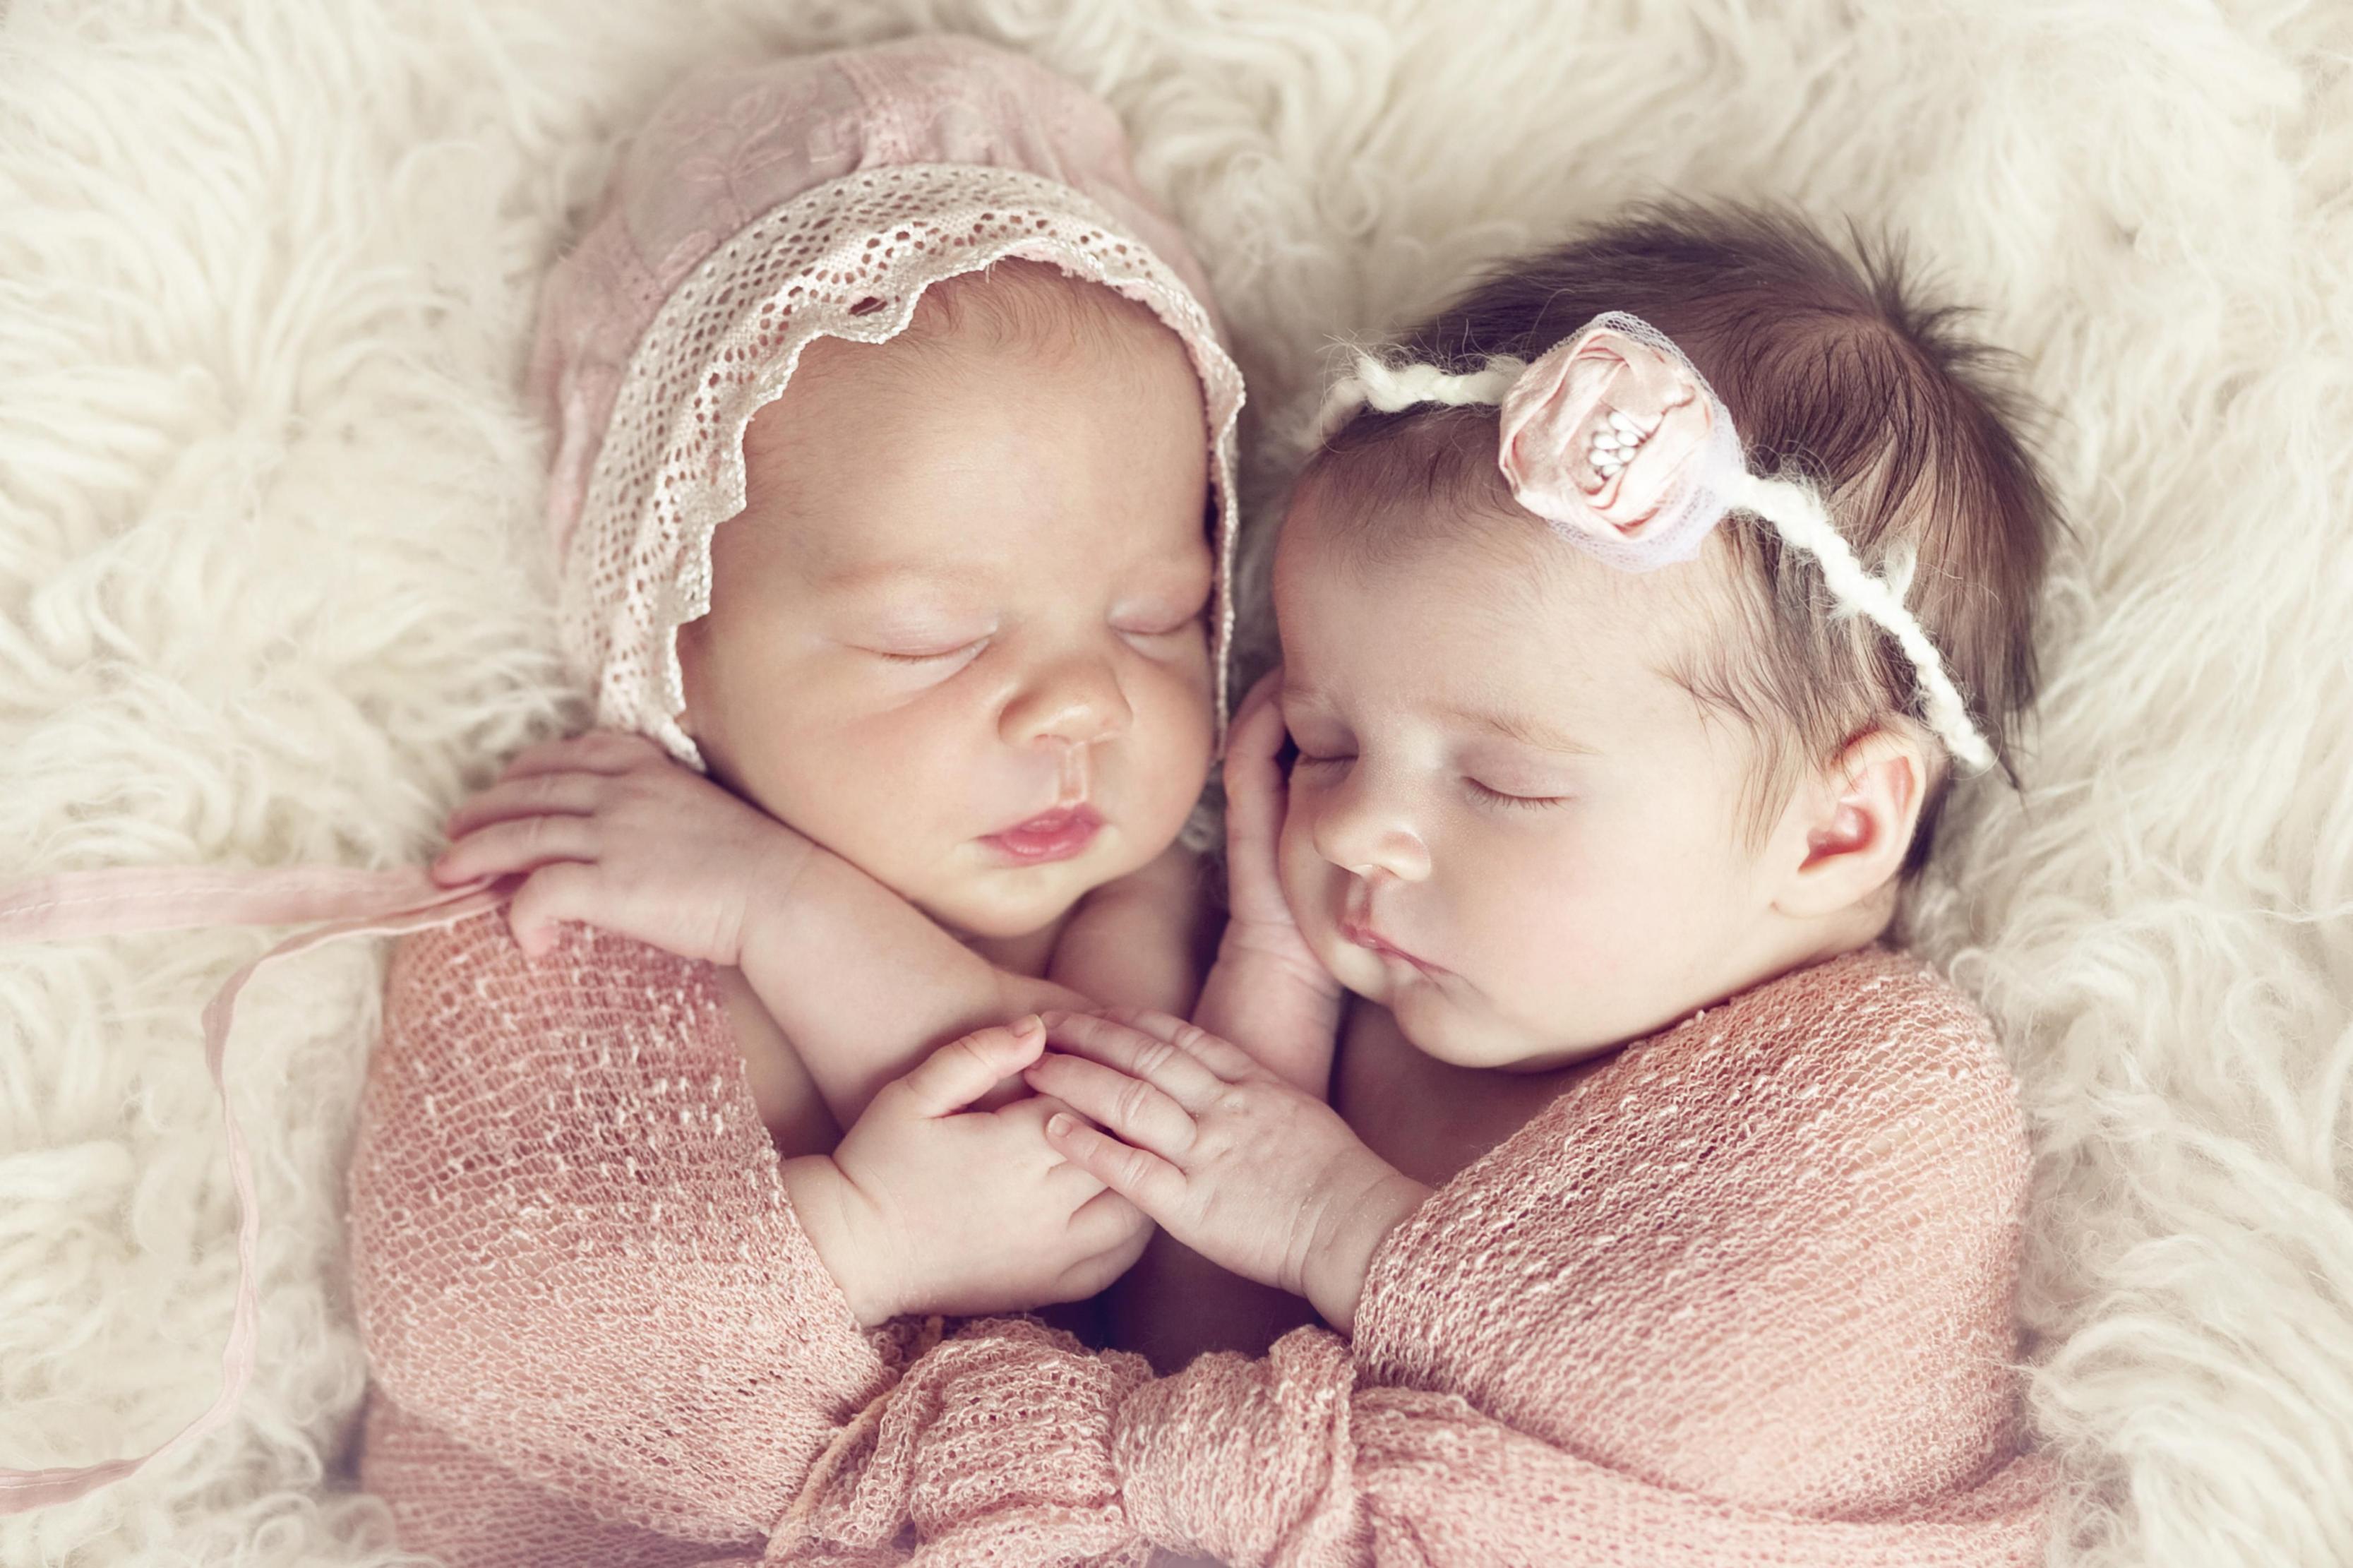 بالصور صور اطفال صغار , اجمل صورة طفل كيوت 2291 7